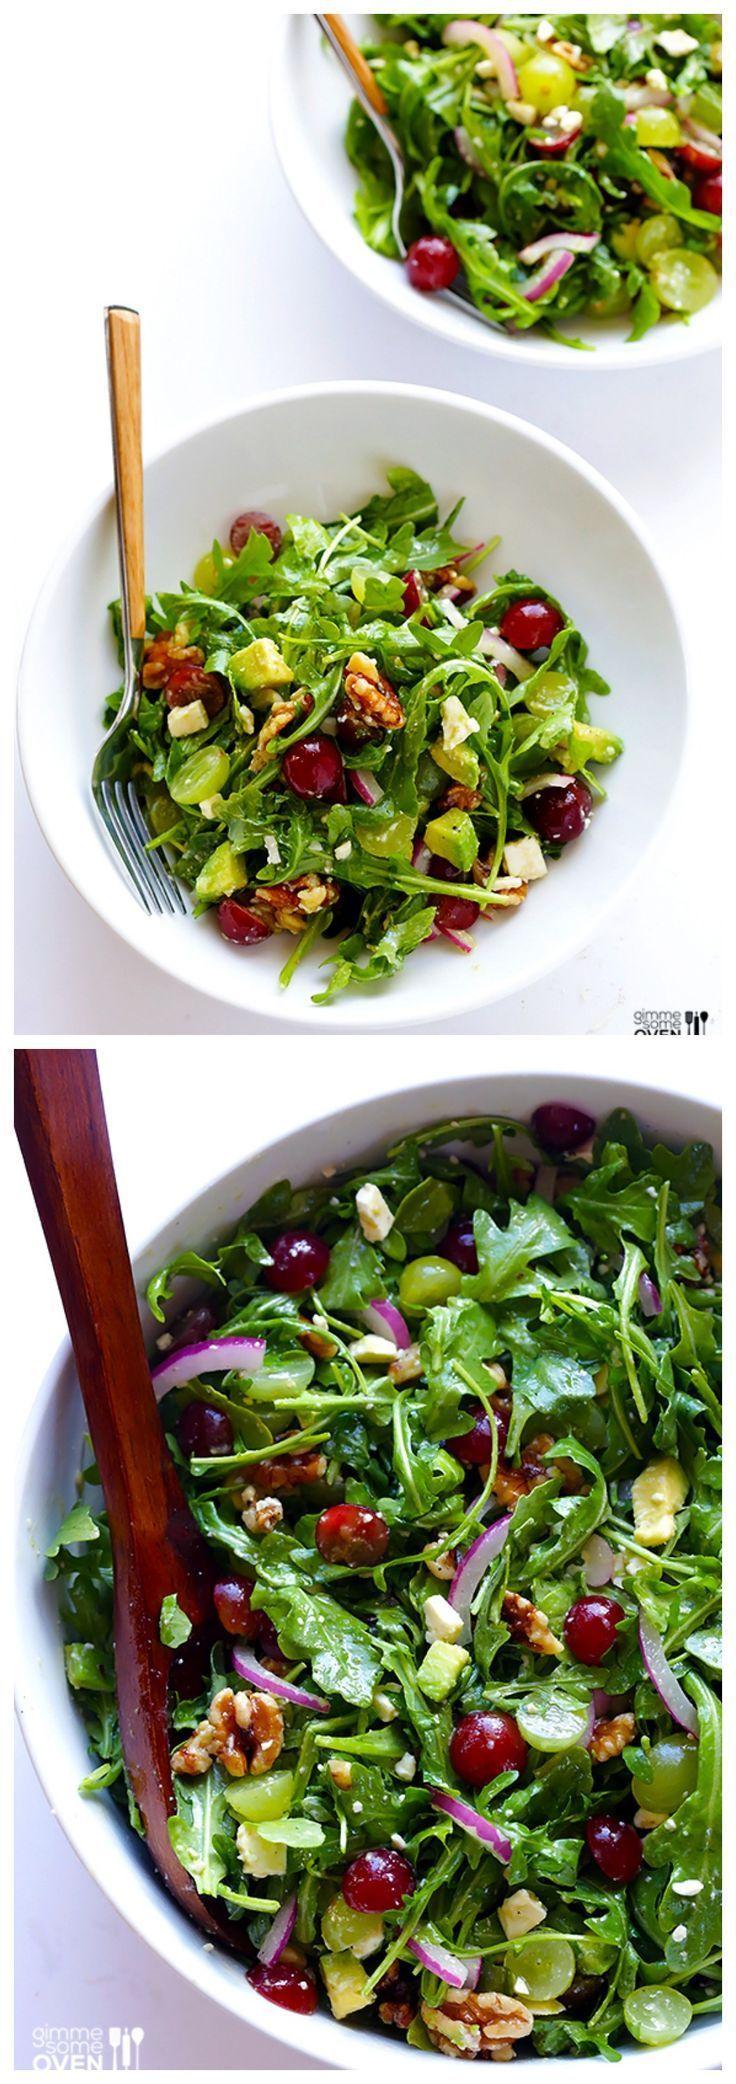 Grape, Avocado & Arugula Salad -- this simple salad is fresh, light, and full of wonderful sweet flavors you'll love!